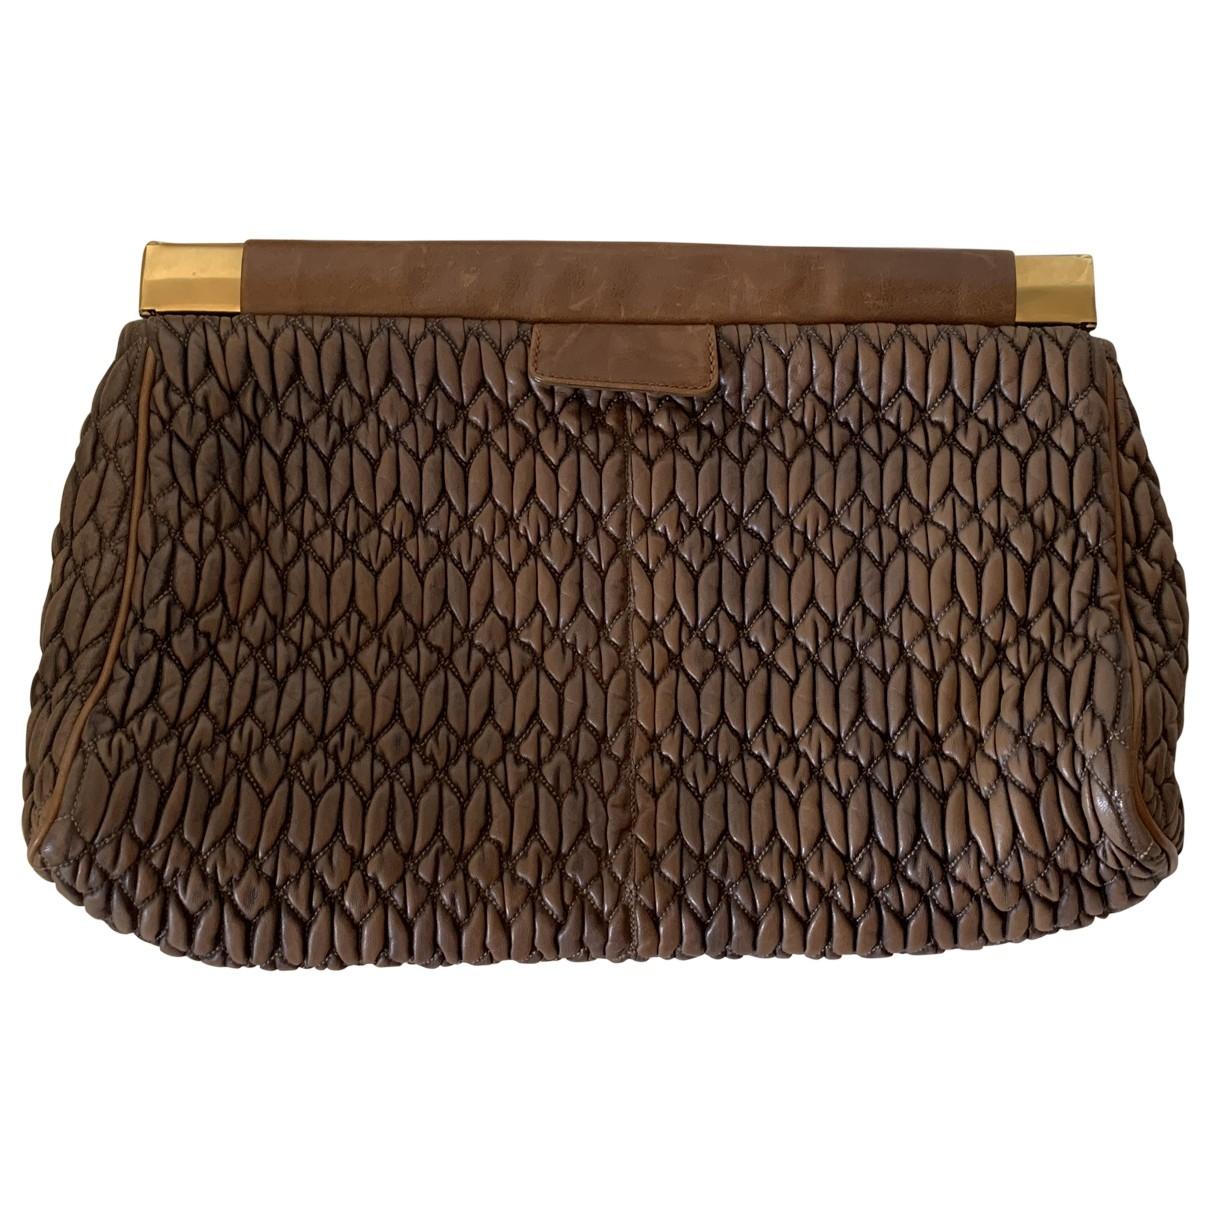 Miu Miu Matelassé Brown Leather Clutch bag for Women \N